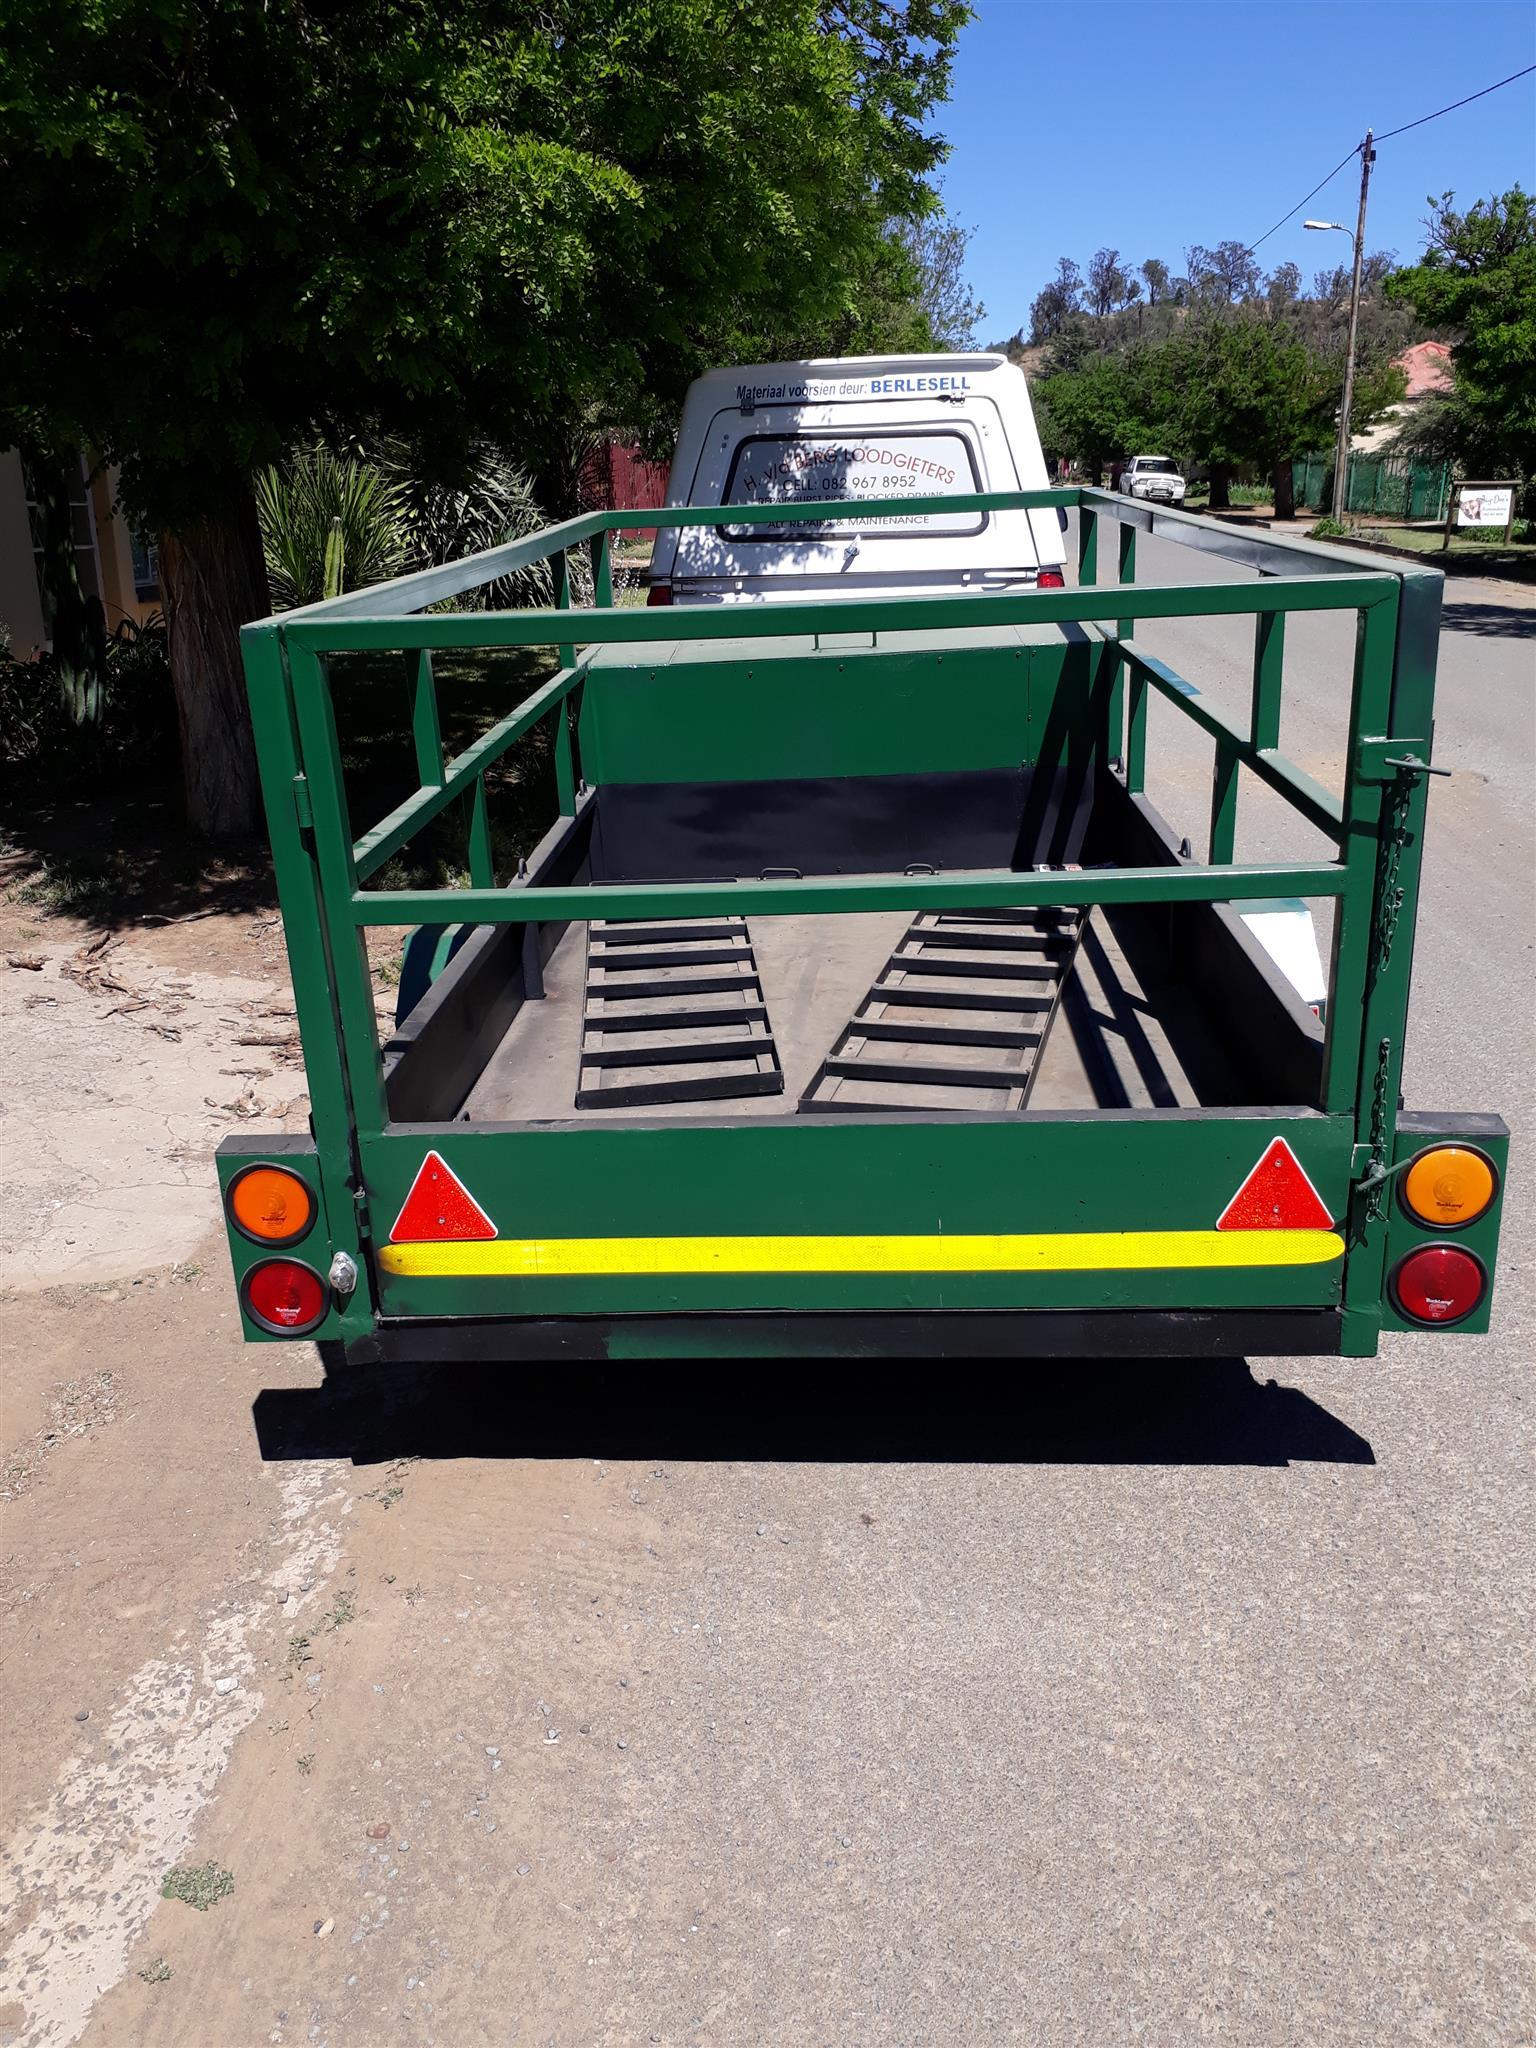 Squad or bike trailer for sale